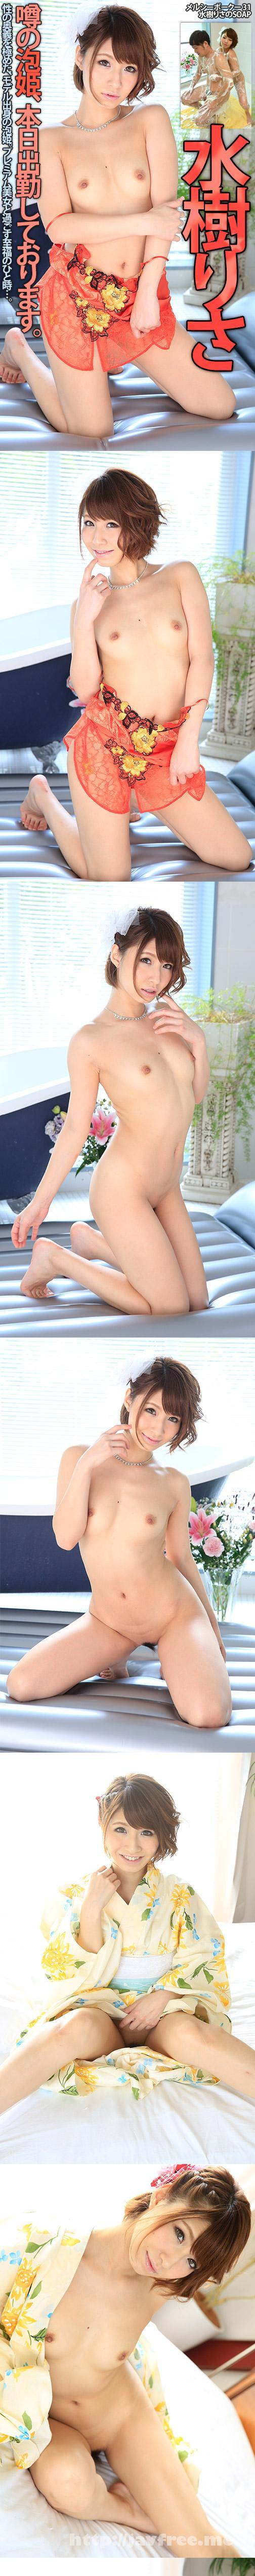 [MCDV 31] メルシーボークー DV 31 水樹りさのSOAP魂 : 水樹りさ Risa Mizuki MCDV